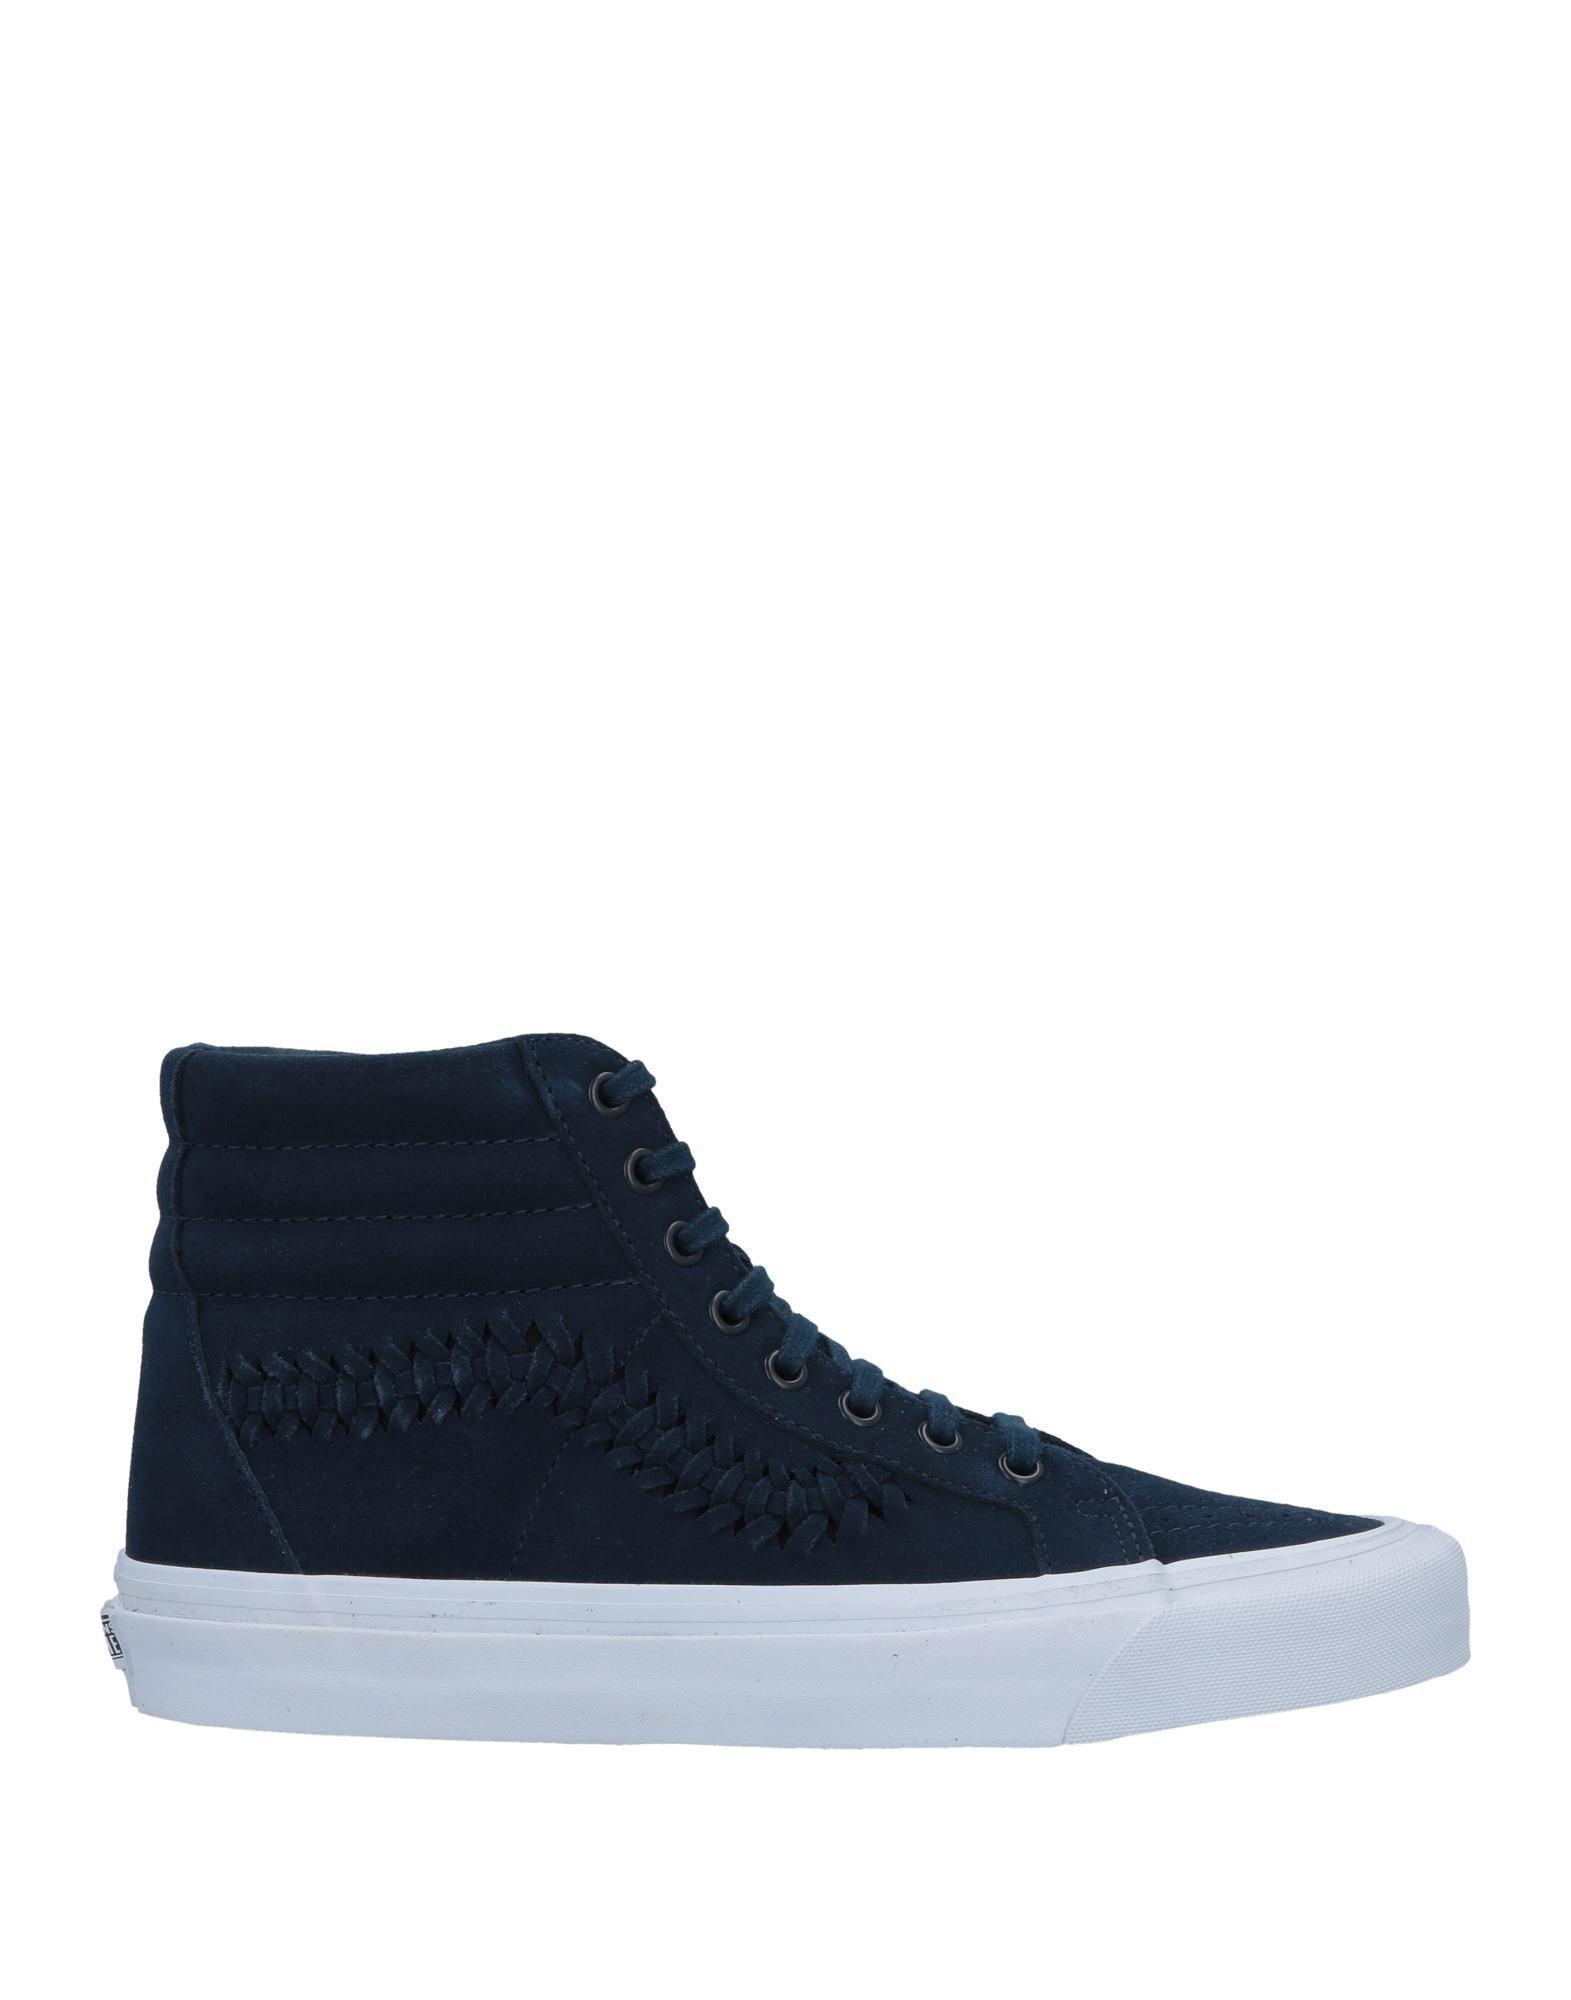 3b1d35f123 Vans High-tops   Sneakers in Blue for Men - Lyst